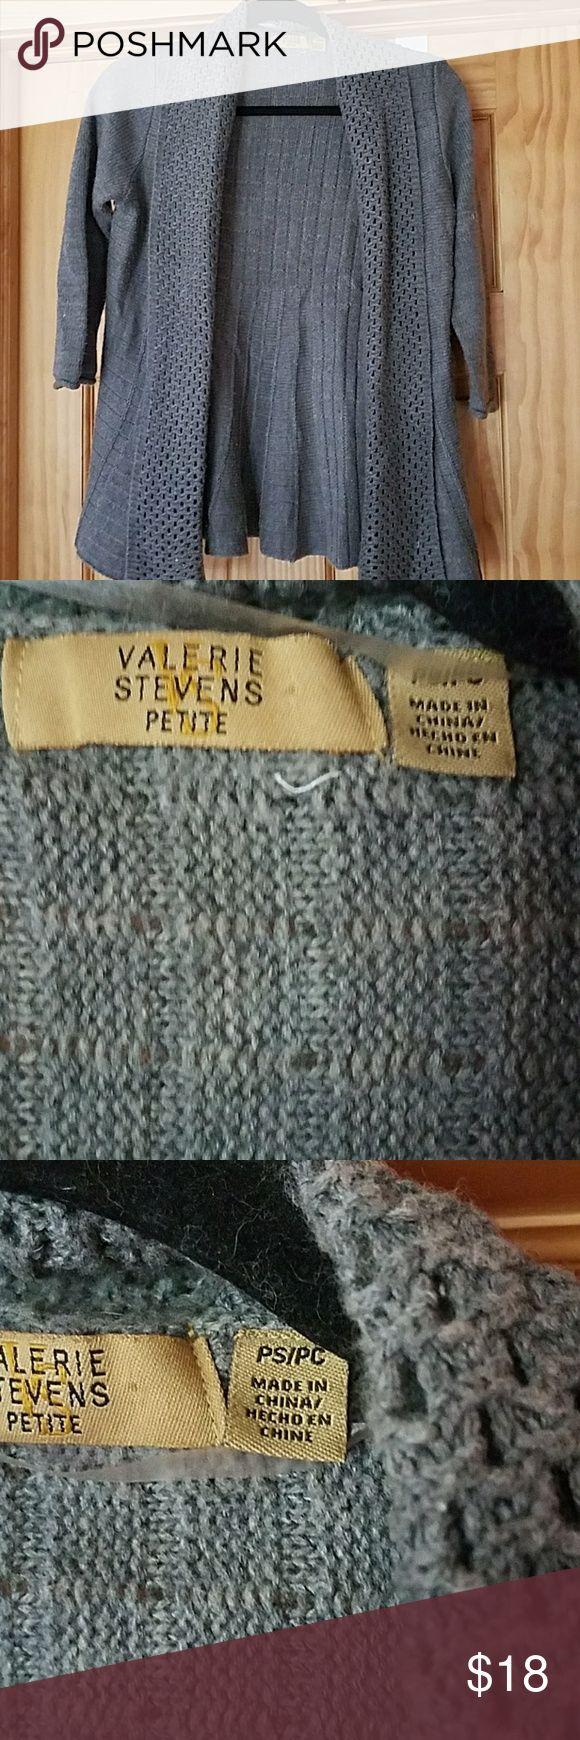 Valerie Stevens Petite Sweater Cute Valerie Stevens Petites sweater Valerie Stevens Sweaters